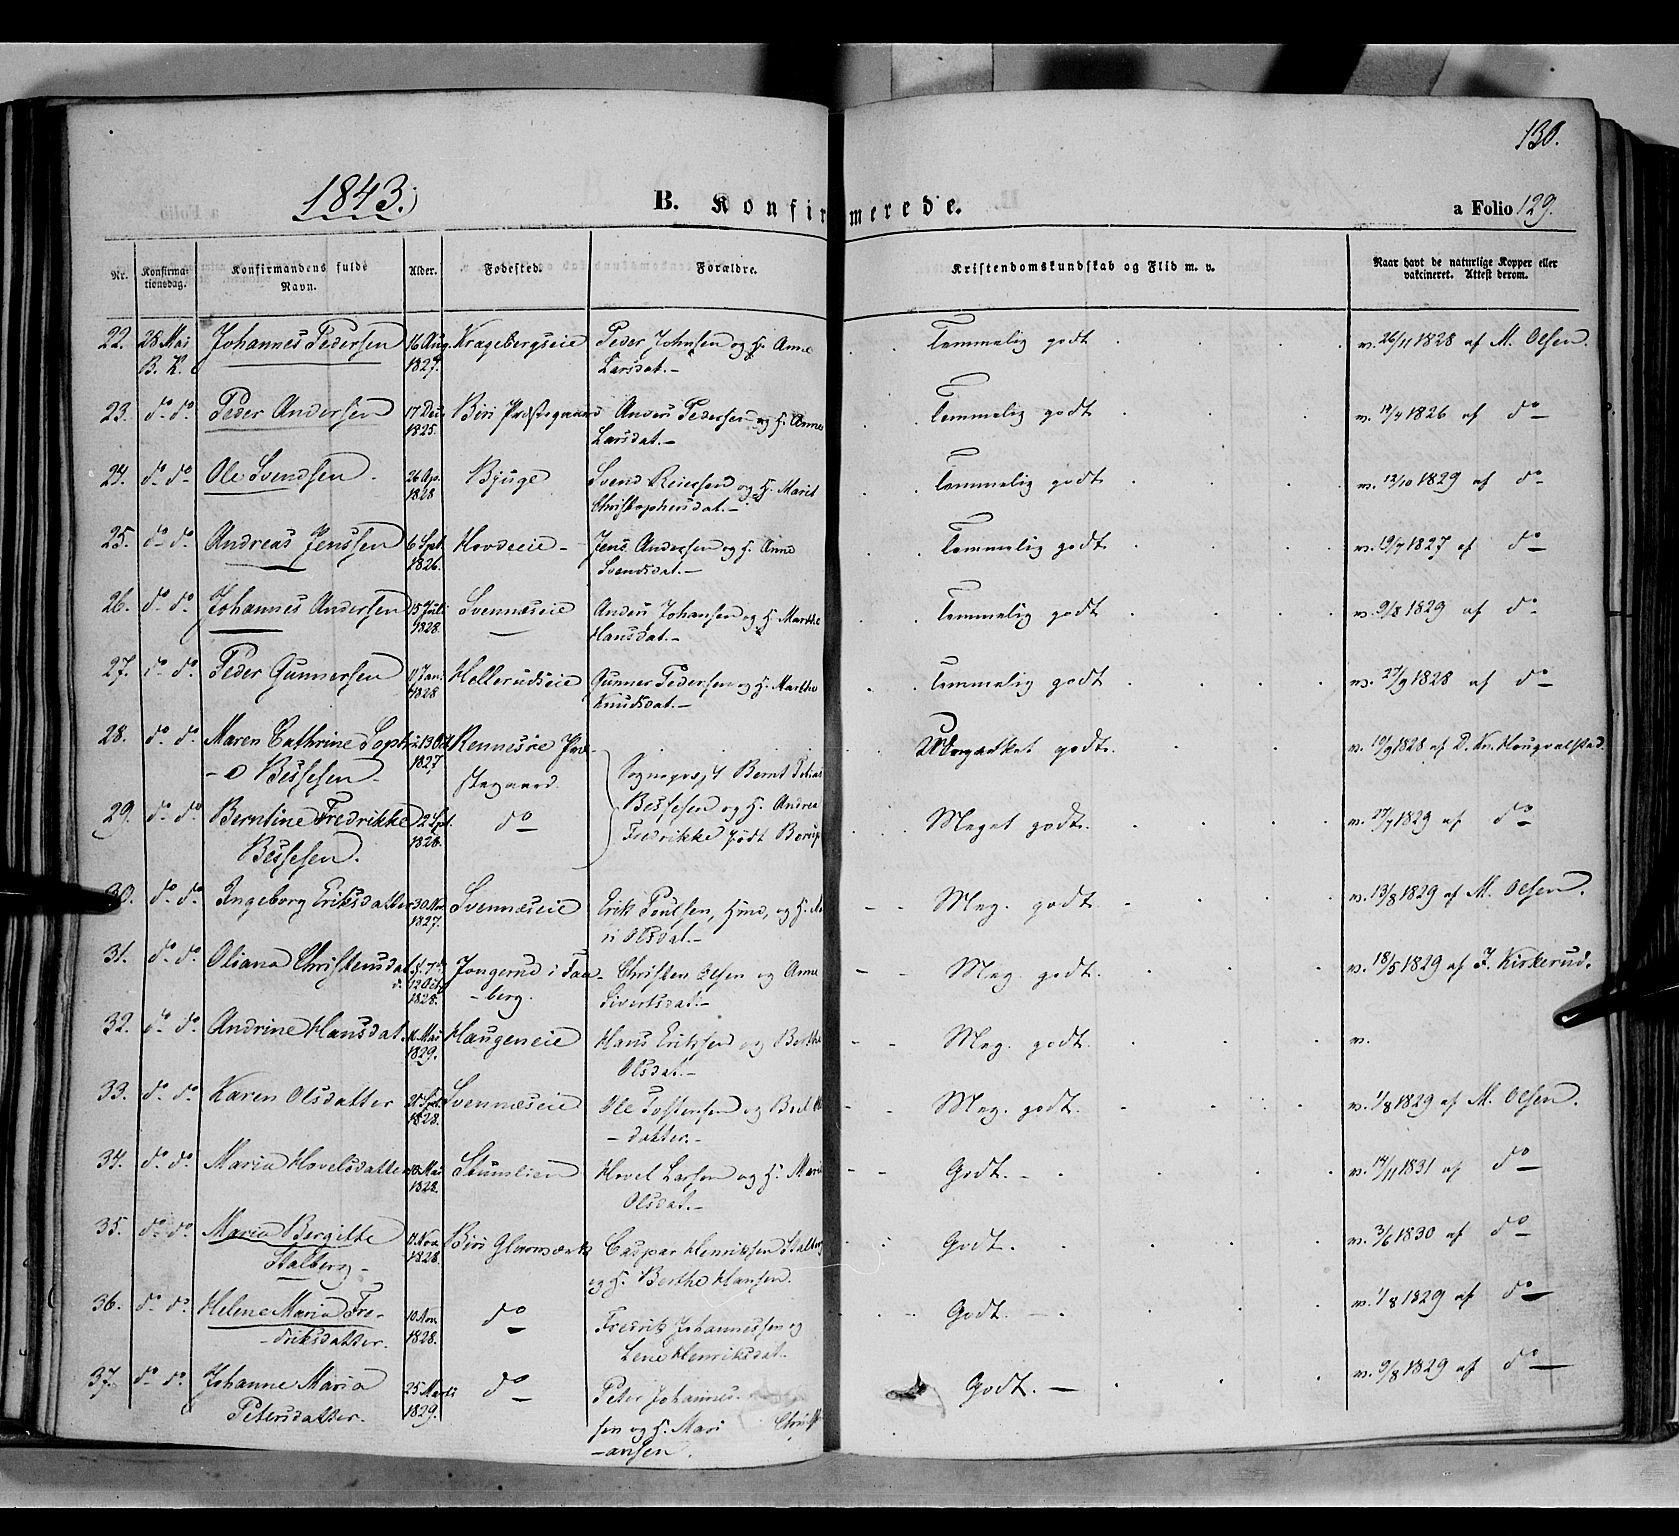 SAH, Biri prestekontor, Ministerialbok nr. 5, 1843-1854, s. 130